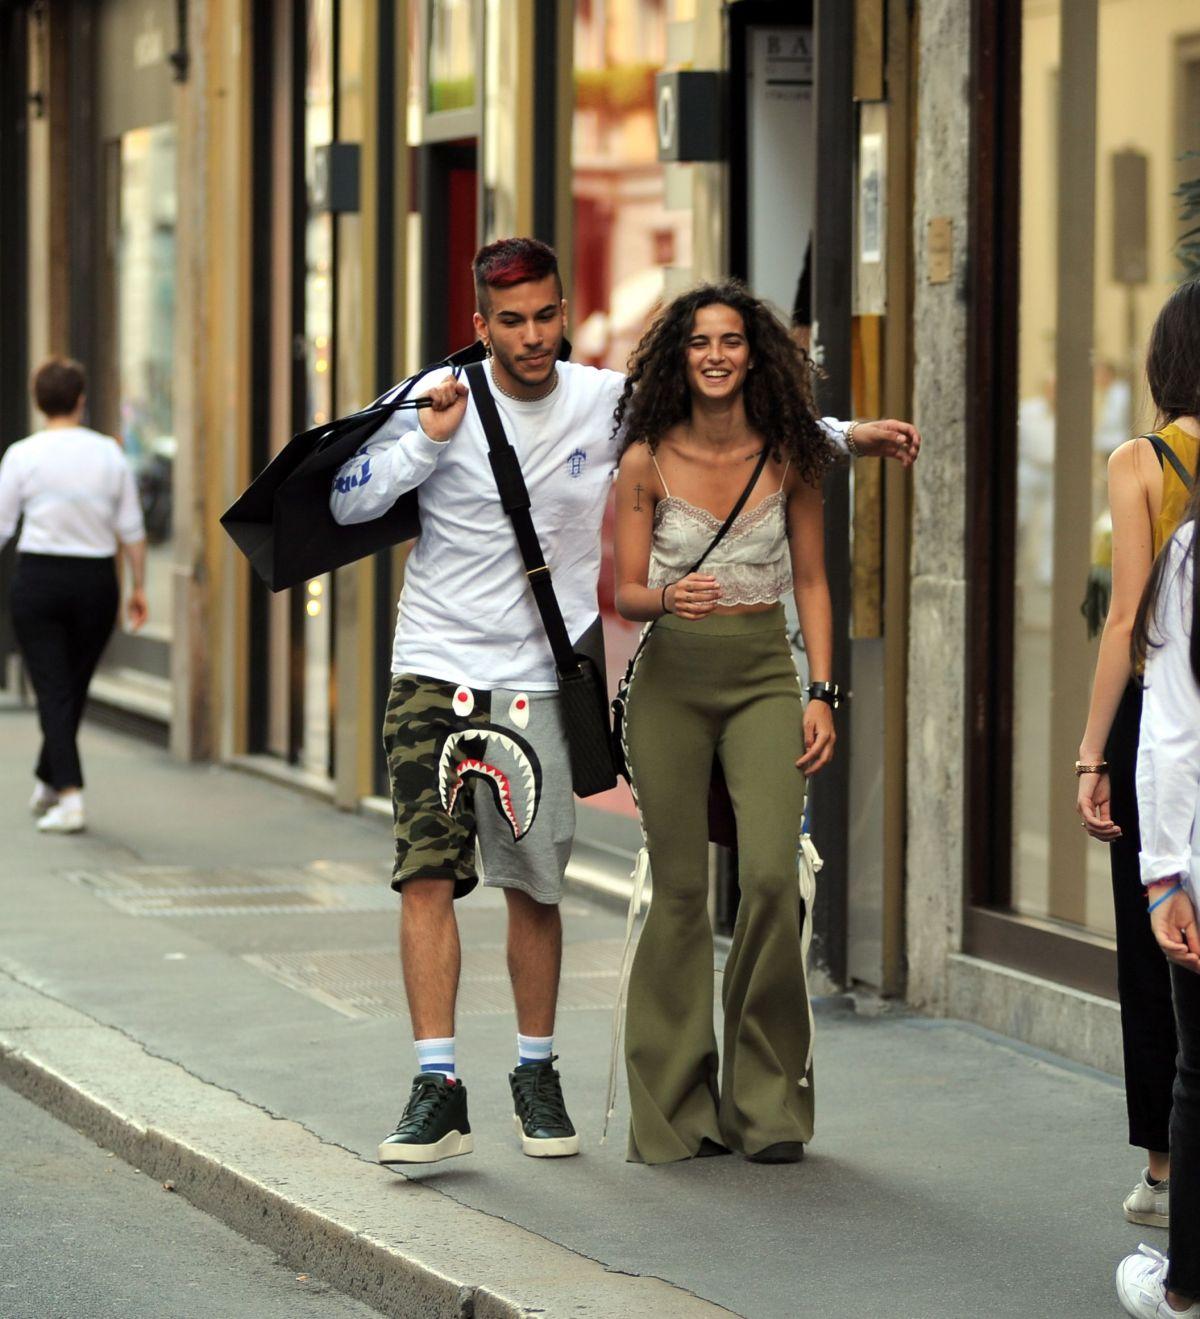 Paparazzi Chiara Scelsi nudes (97 photos), Tits, Fappening, Feet, butt 2015